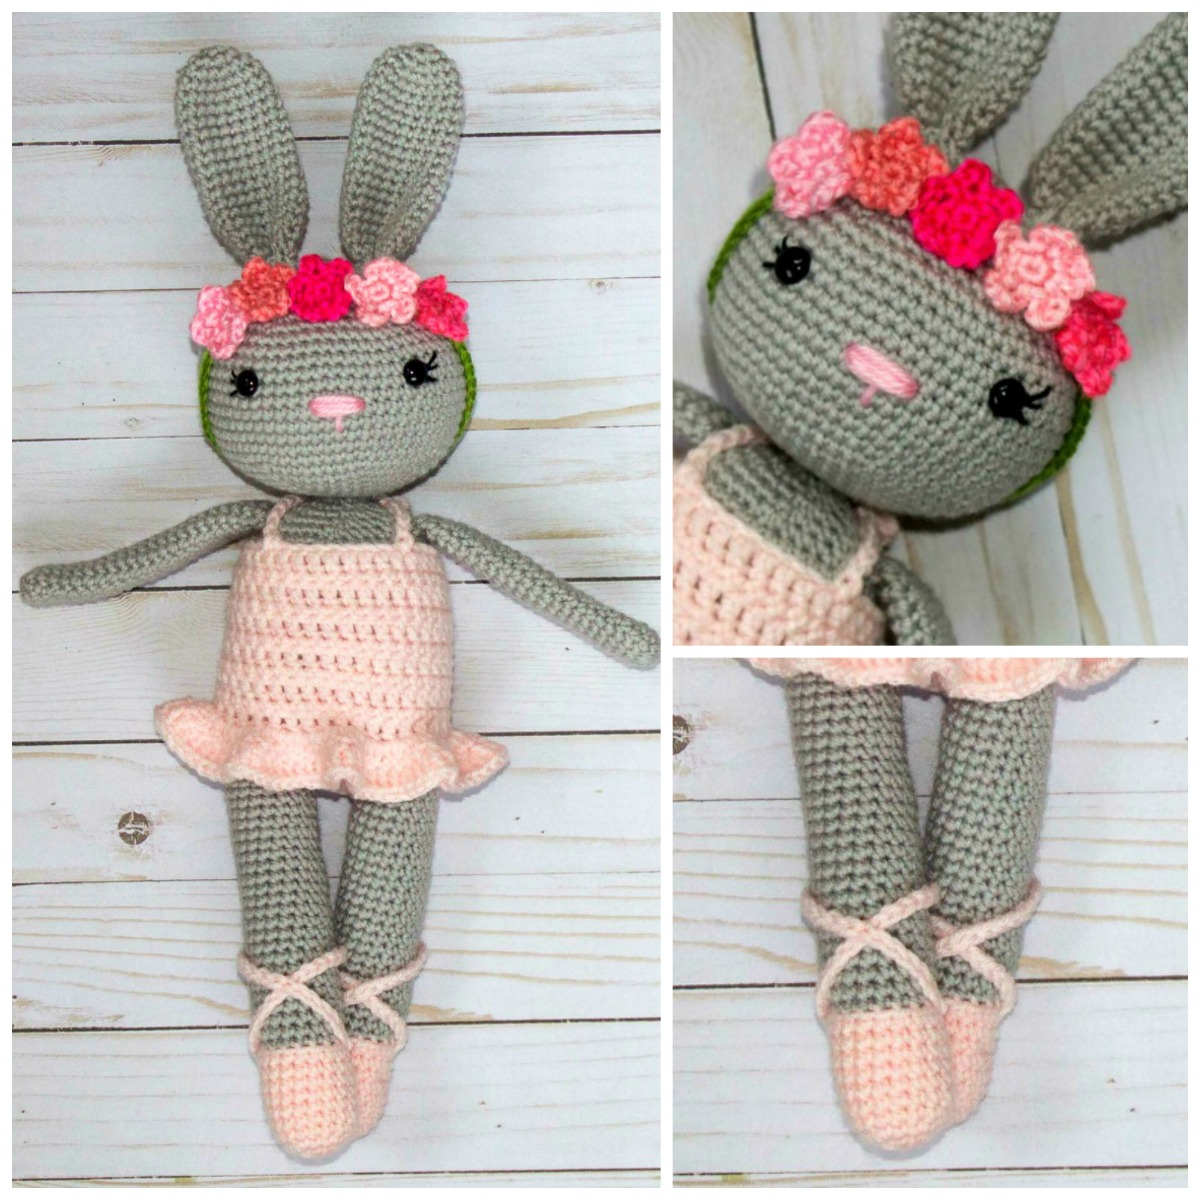 Ballerina Bunny Crochet Pattern - thefriendlyredfox.com